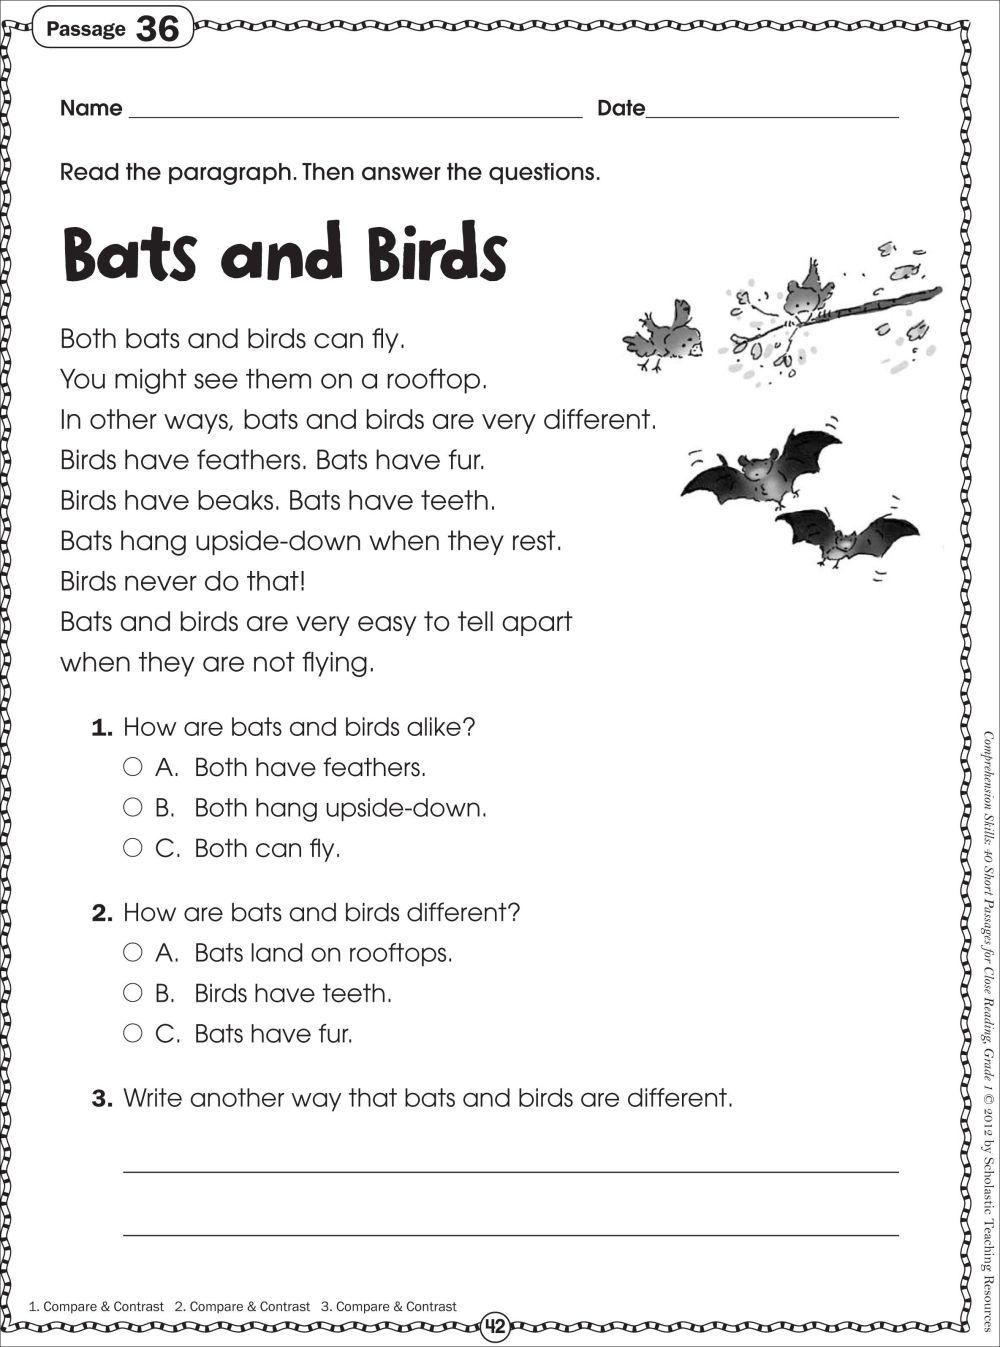 medium resolution of 16 Best Grade 3 Reading Comprehension Worksheets images on Best Worksheets  Collection